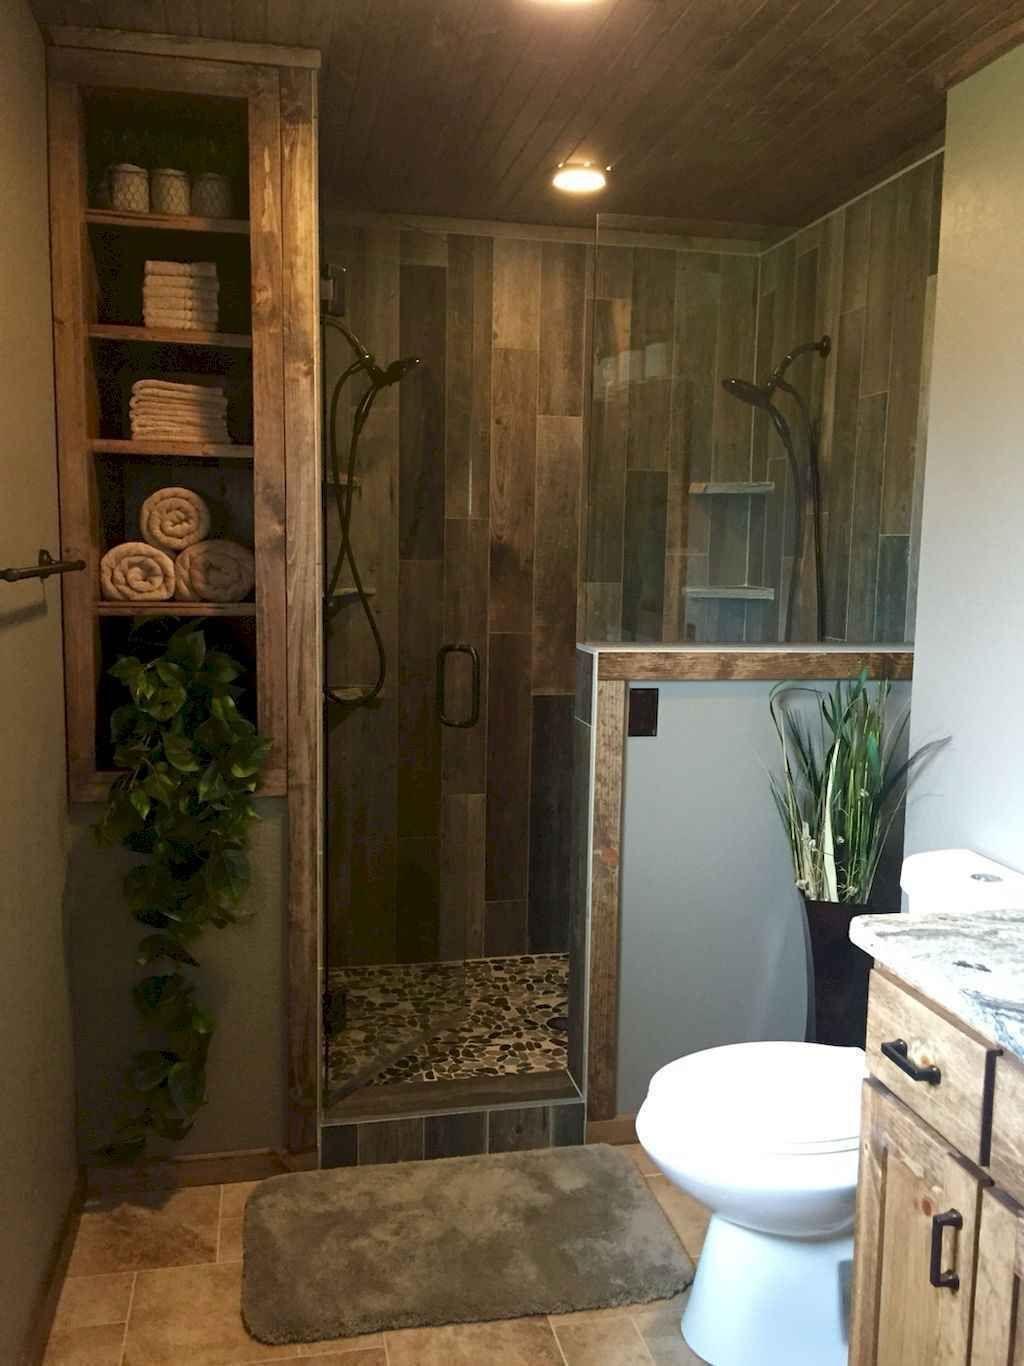 80 stunning tile shower designs ideas for bathroom remodel on bathroom renovation ideas id=28881